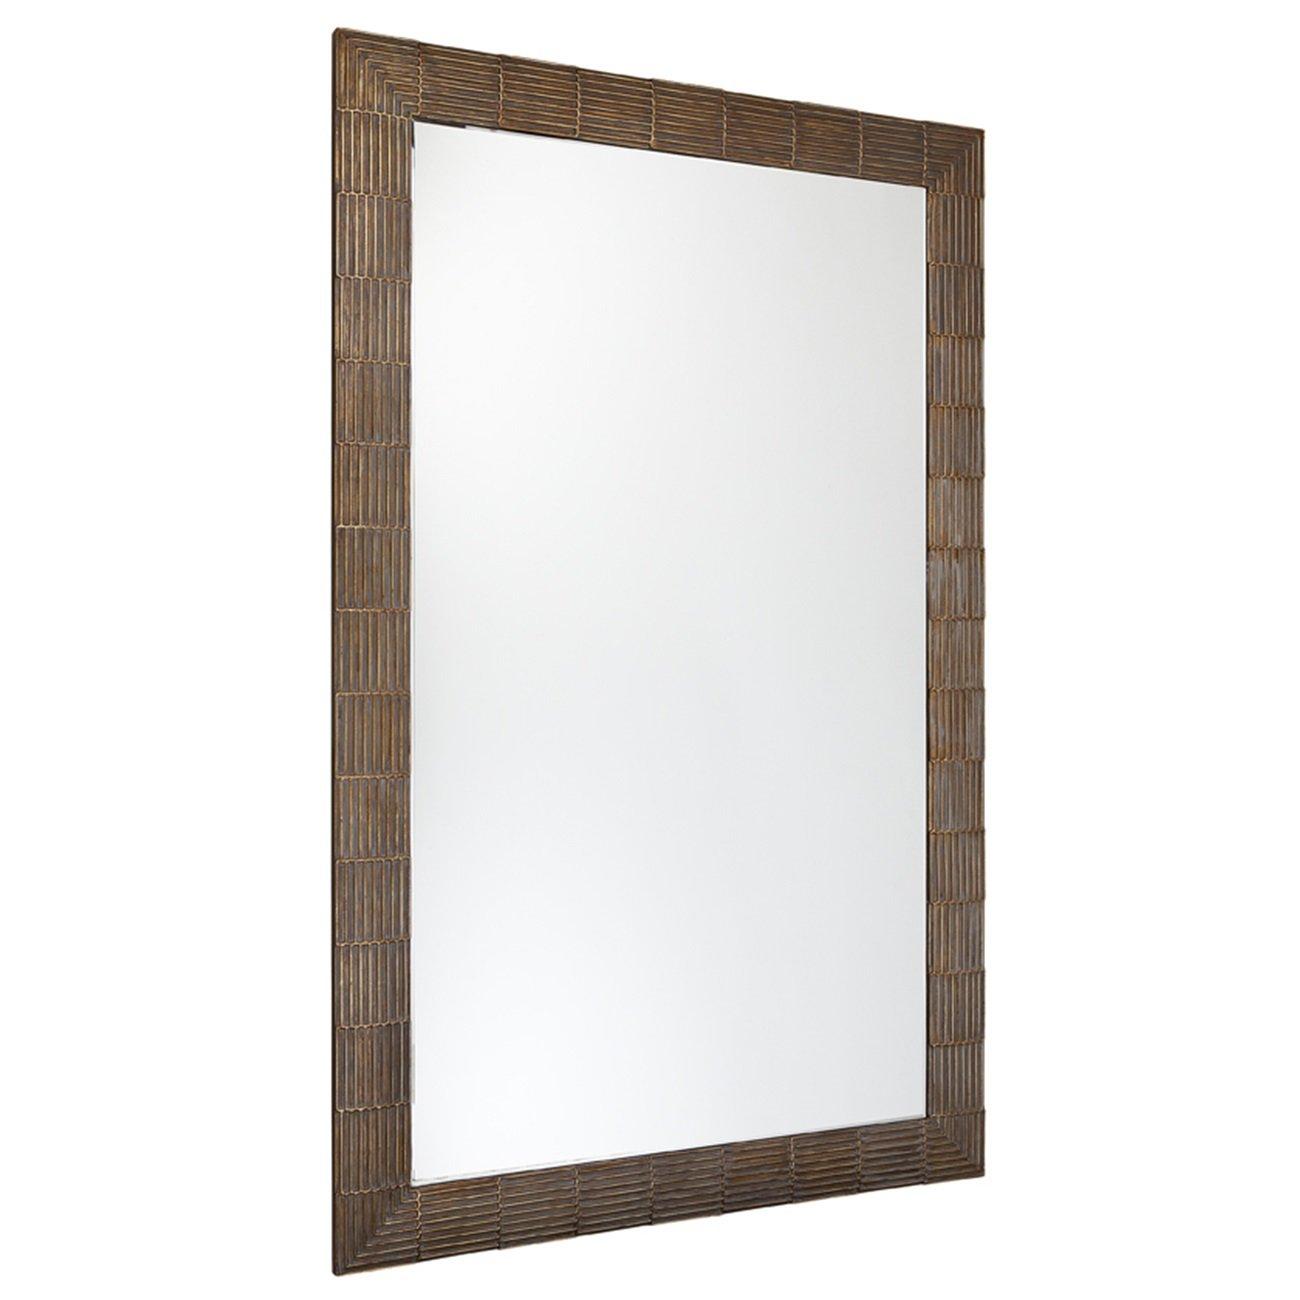 Floor mirrors online australia